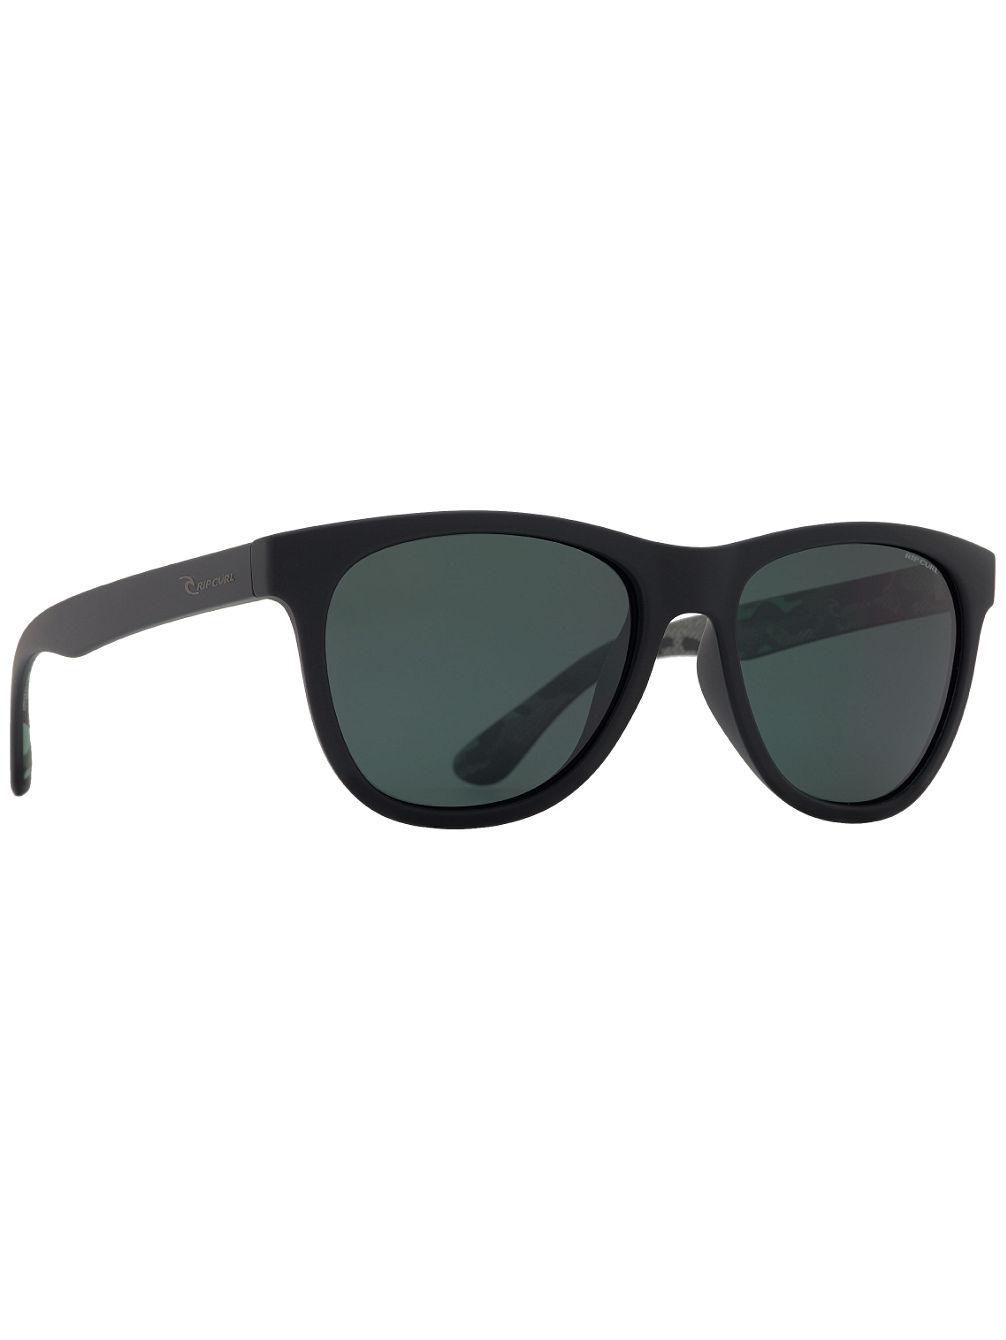 buy rip curl eyewear r2605c black matt black at